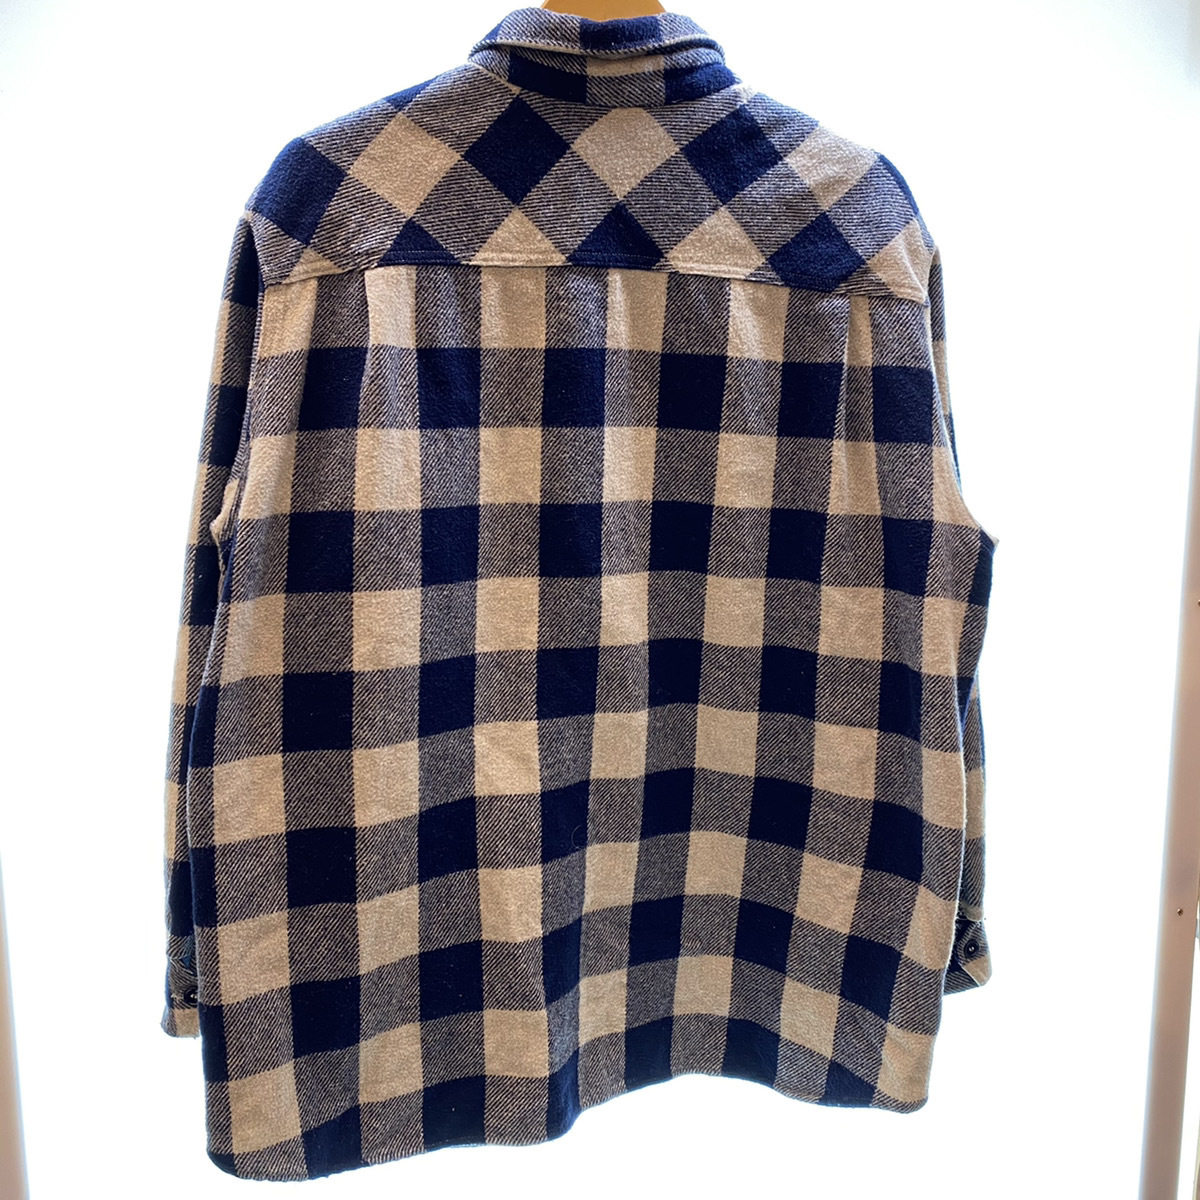 ●Stussy ステューシー OLD Stussy オールドステューシー 90s 90年代 紺タグ チェック ウール シャツ USA製 MADE IN USA 104_画像3